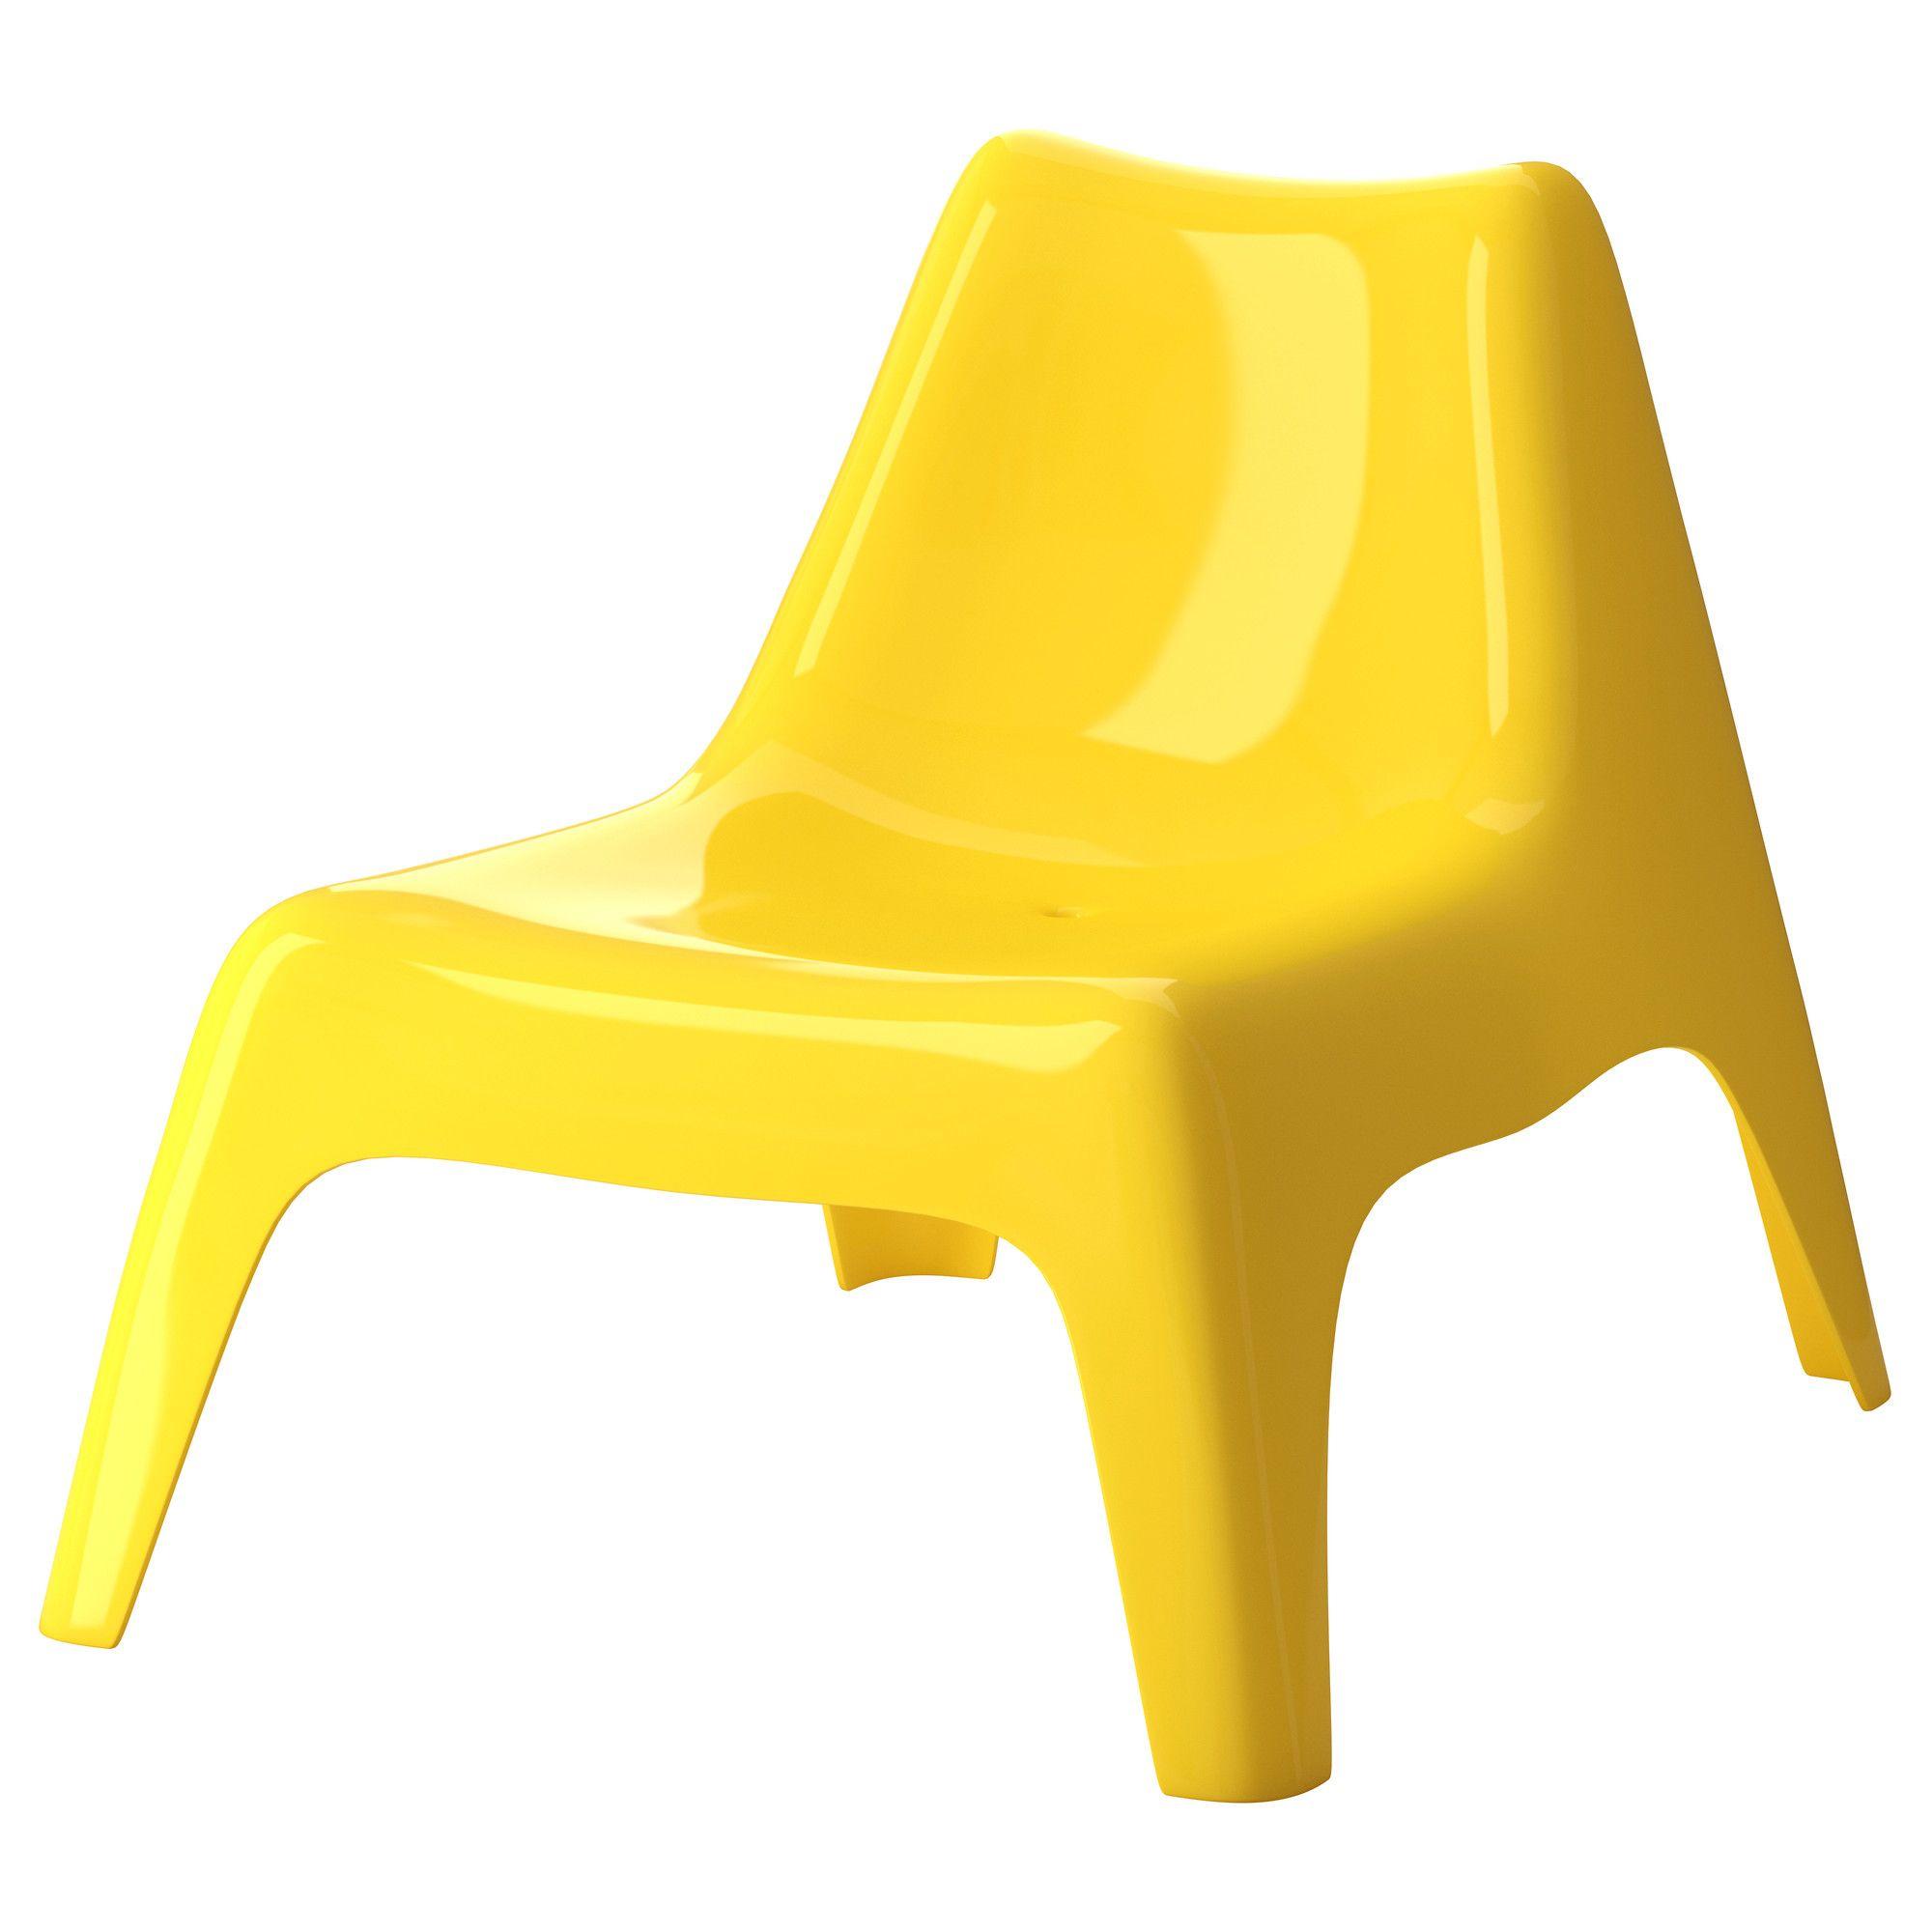 Us - Furniture And Home Furnishings   Afine destiné Table Jardin Plastique Ikea